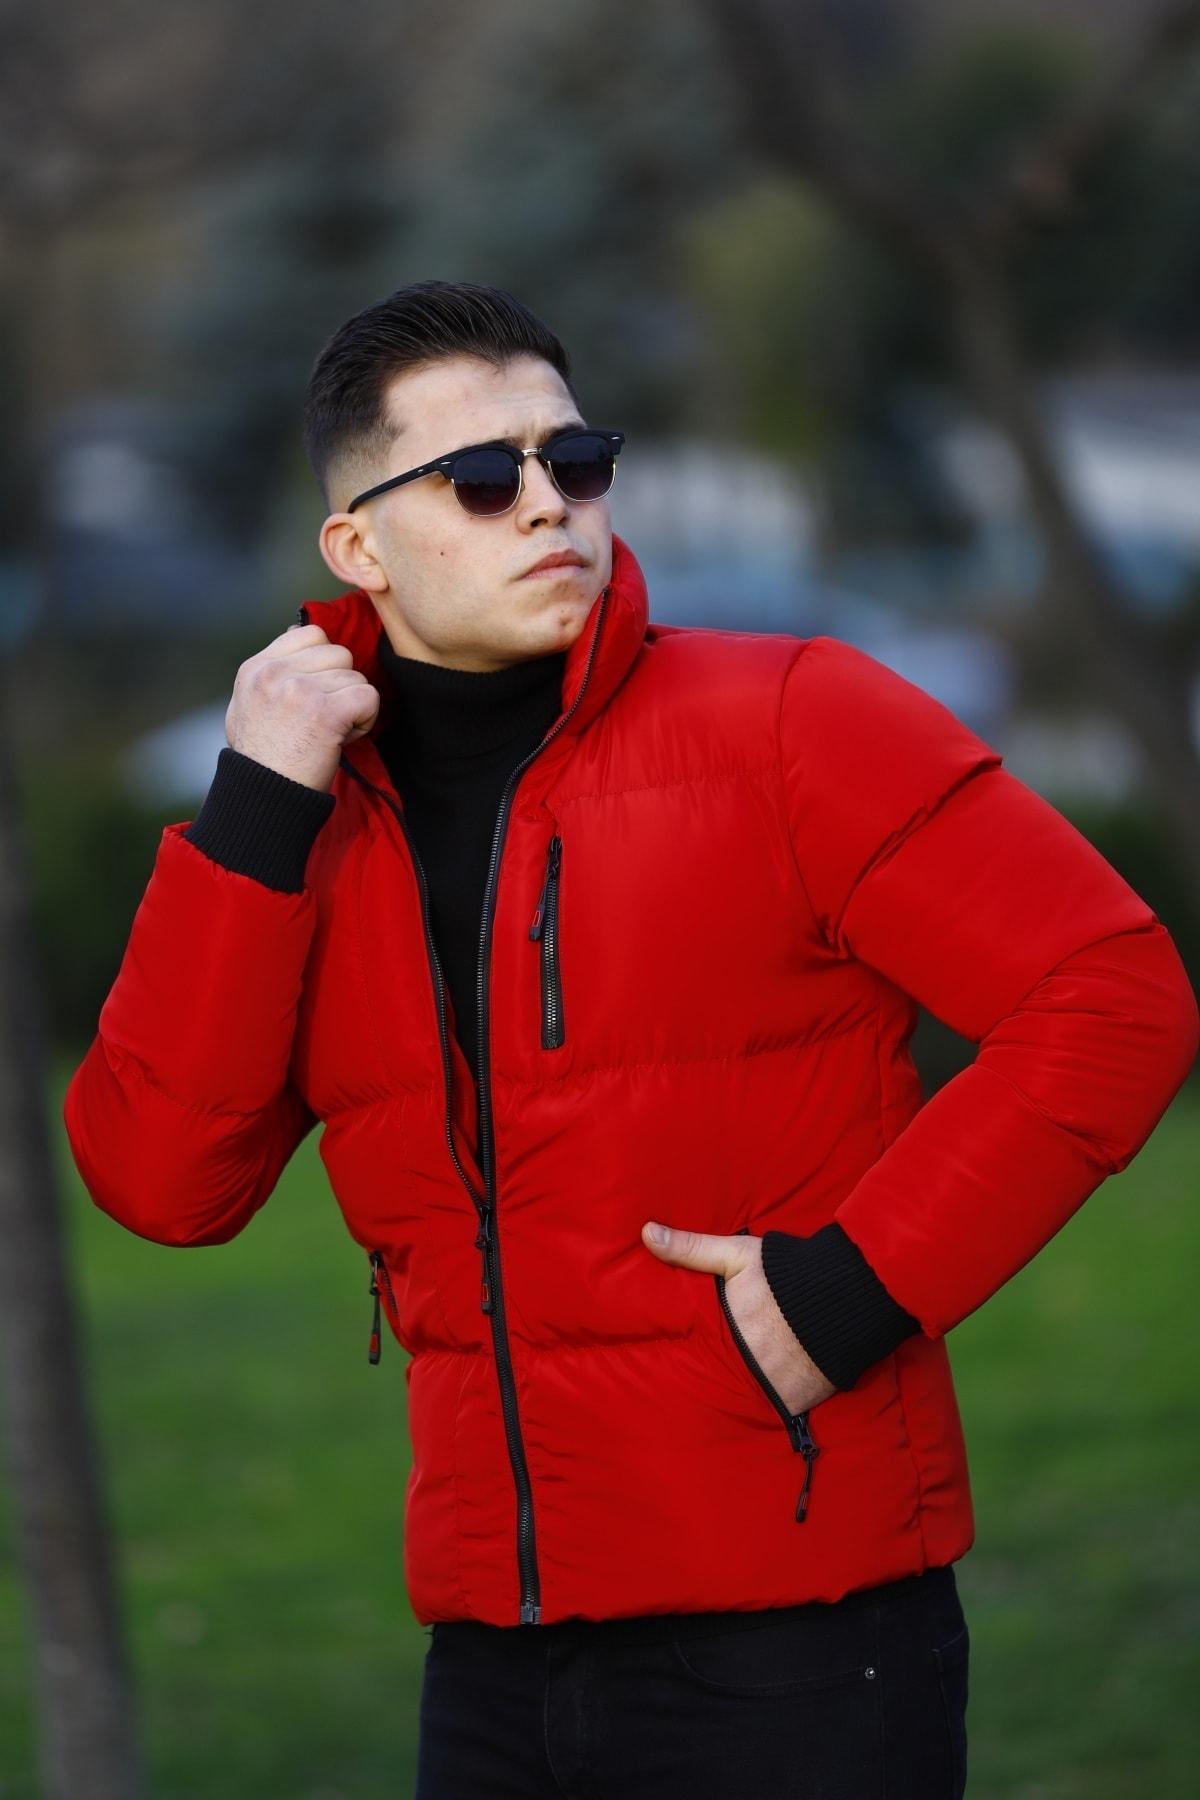 WOWA COMPANY Erkek Kırmızı Şişme Mont 2